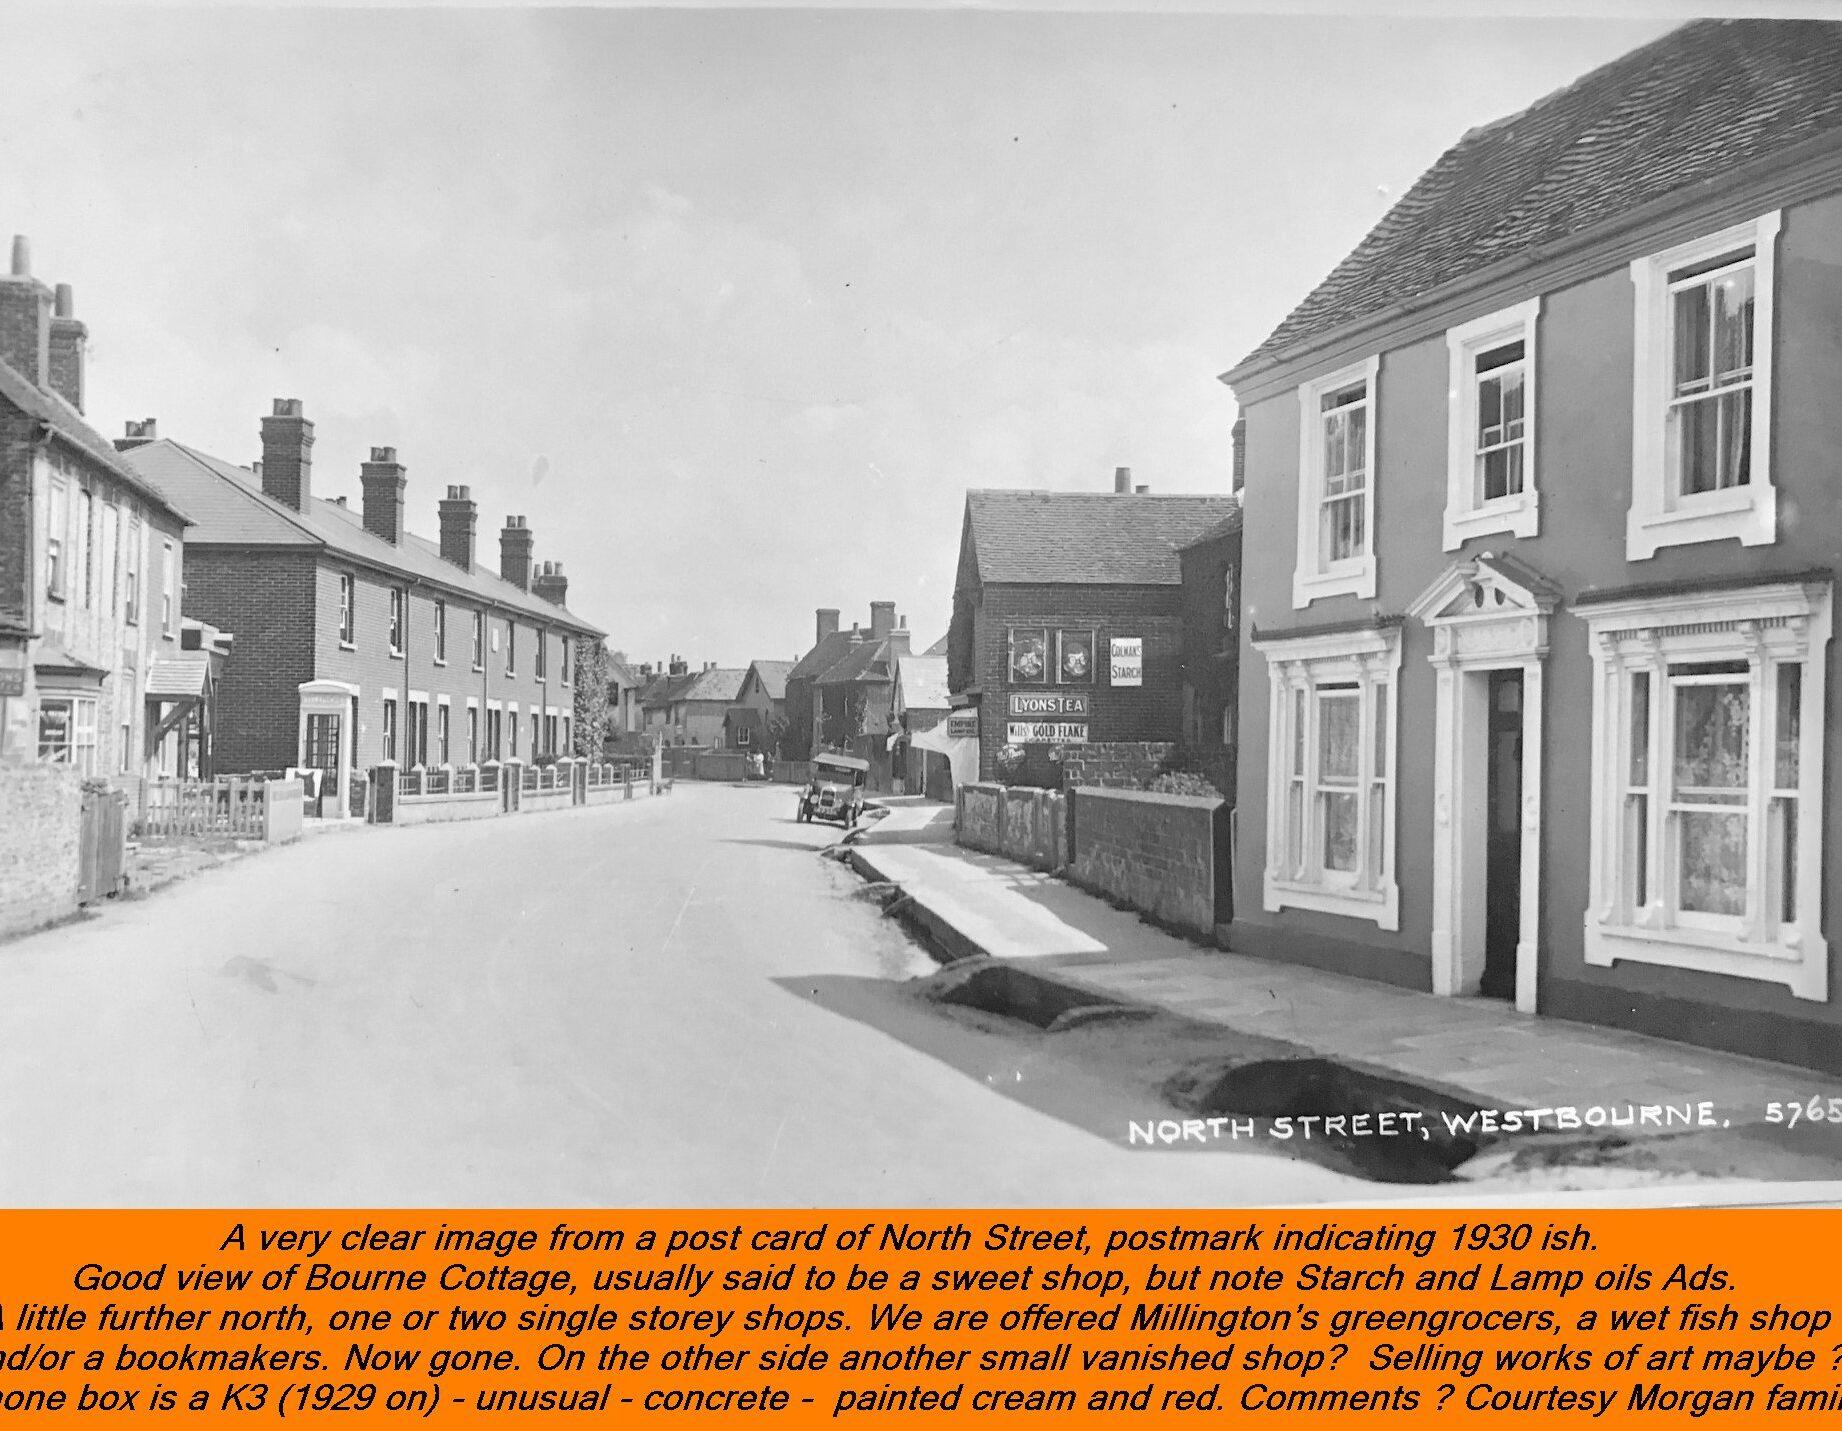 North Street Westbourne 1930